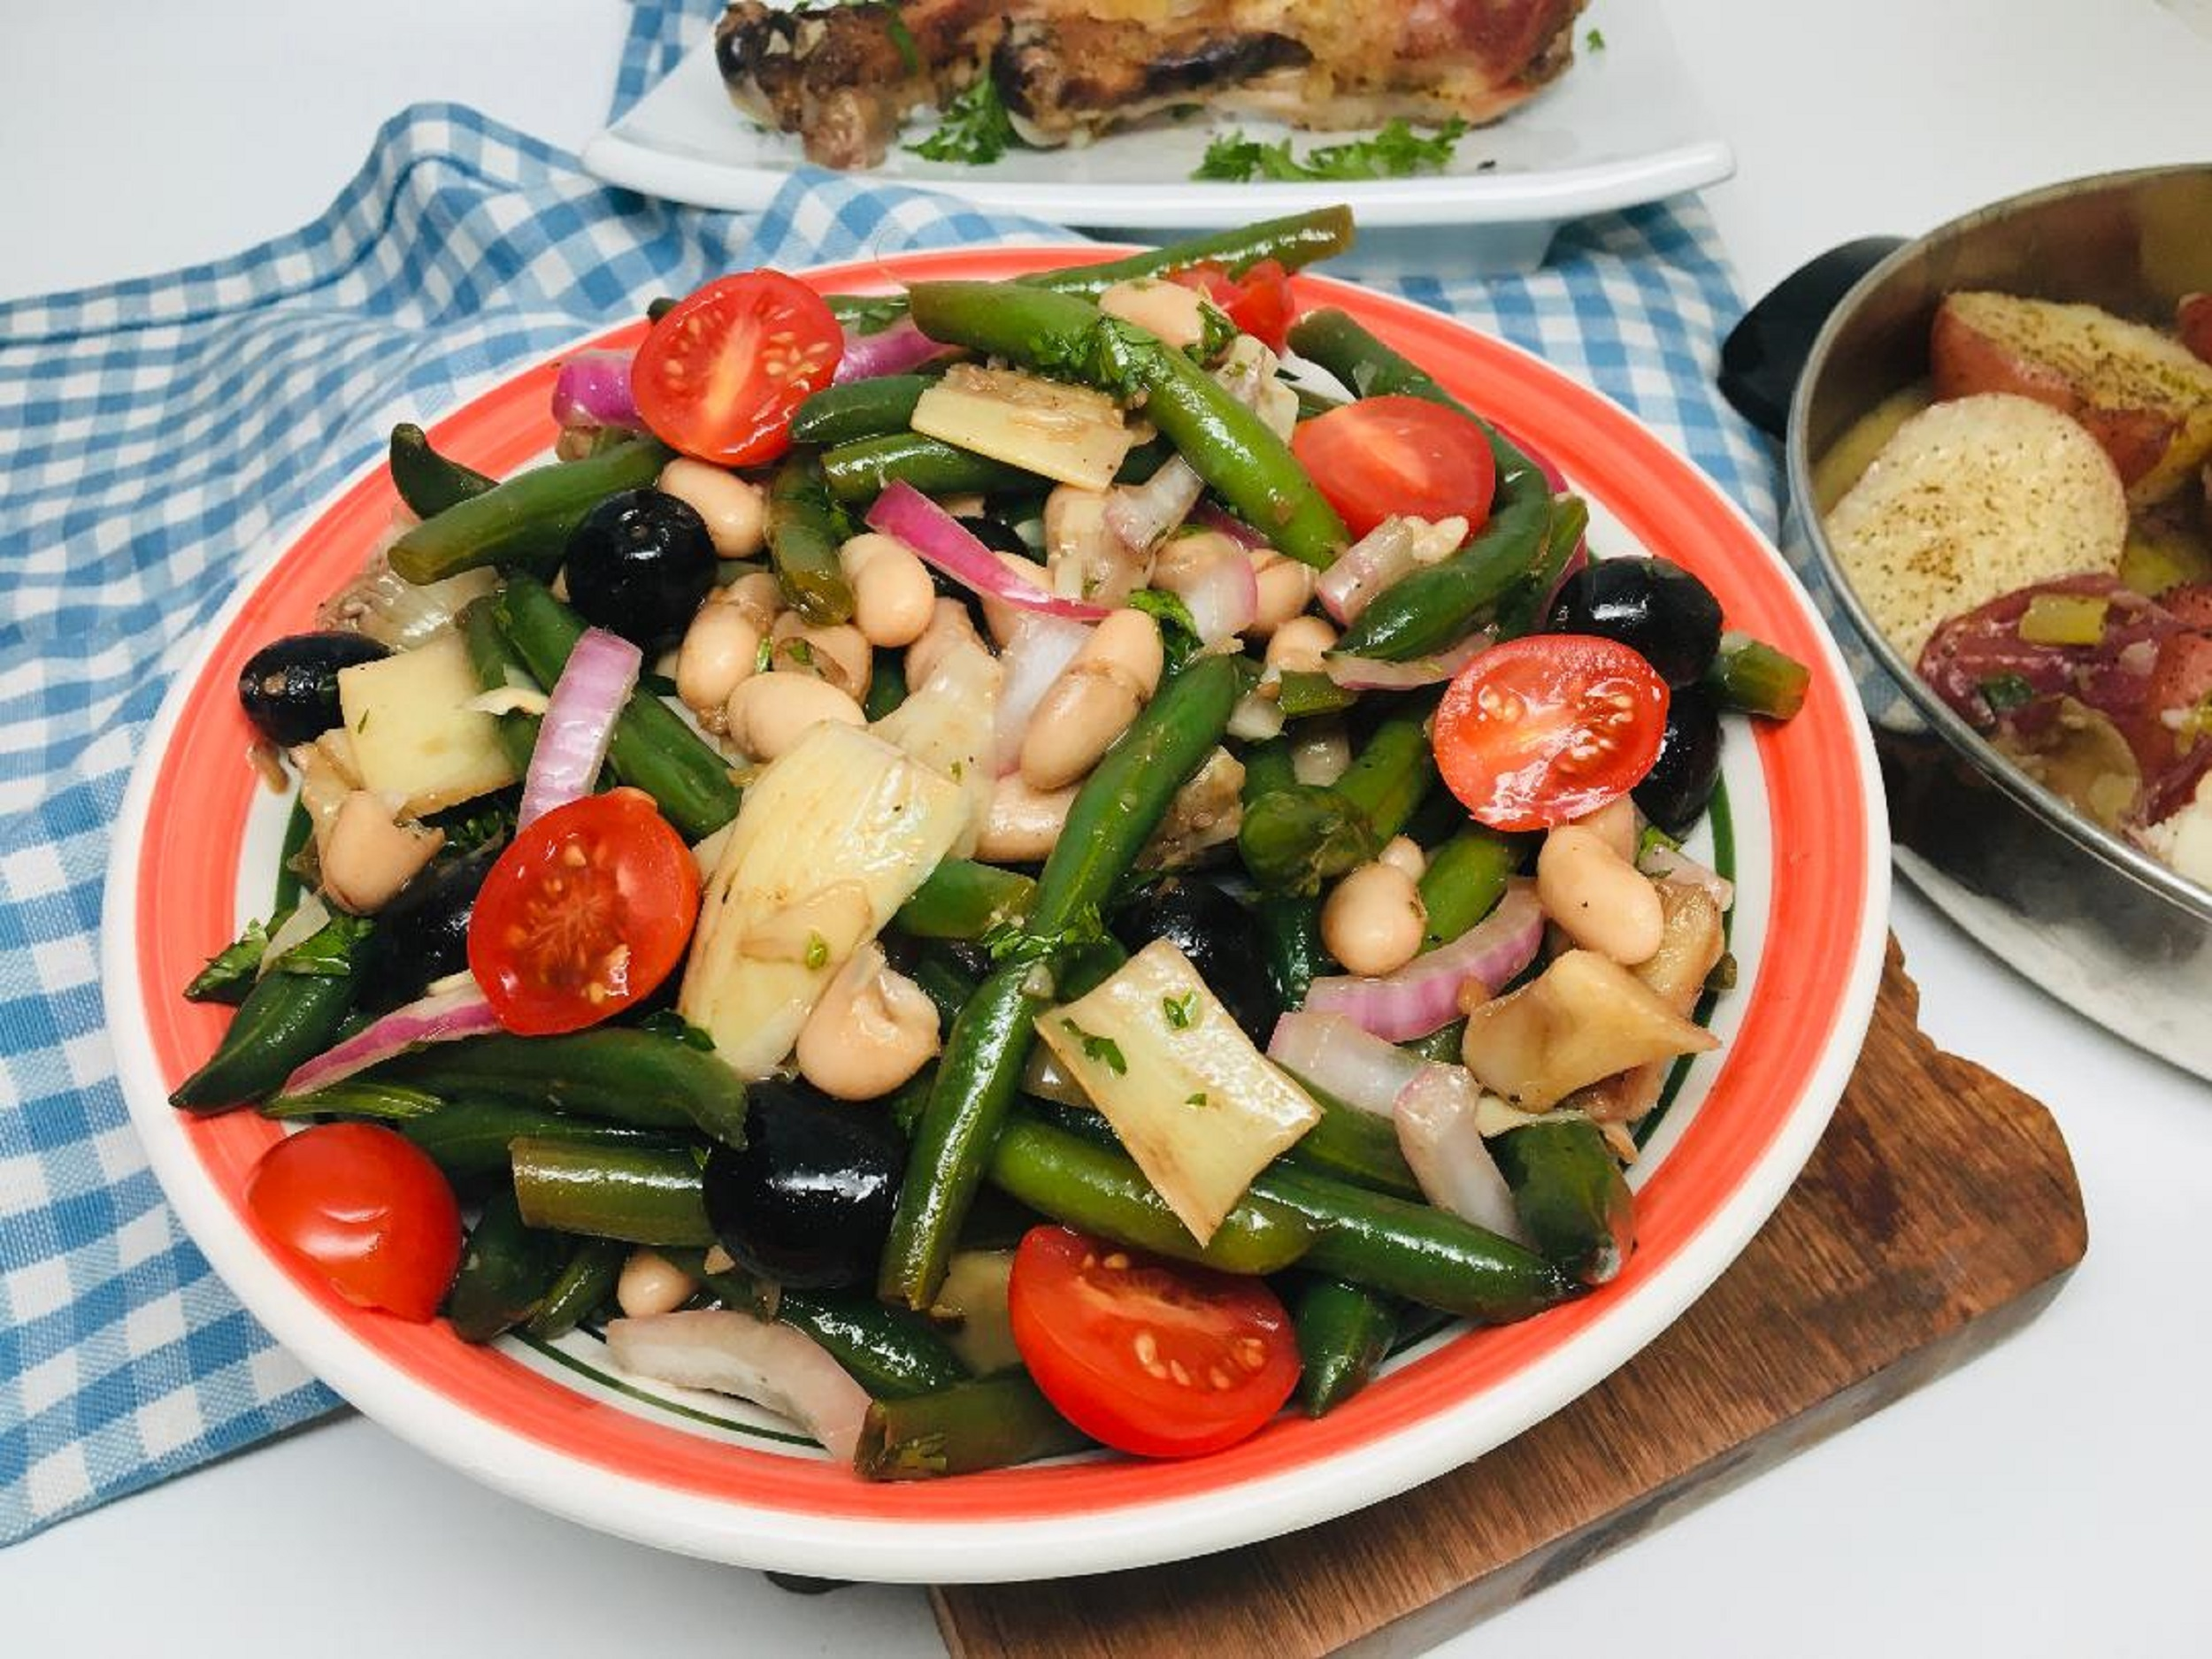 Cold Green Bean and Artichoke Salad